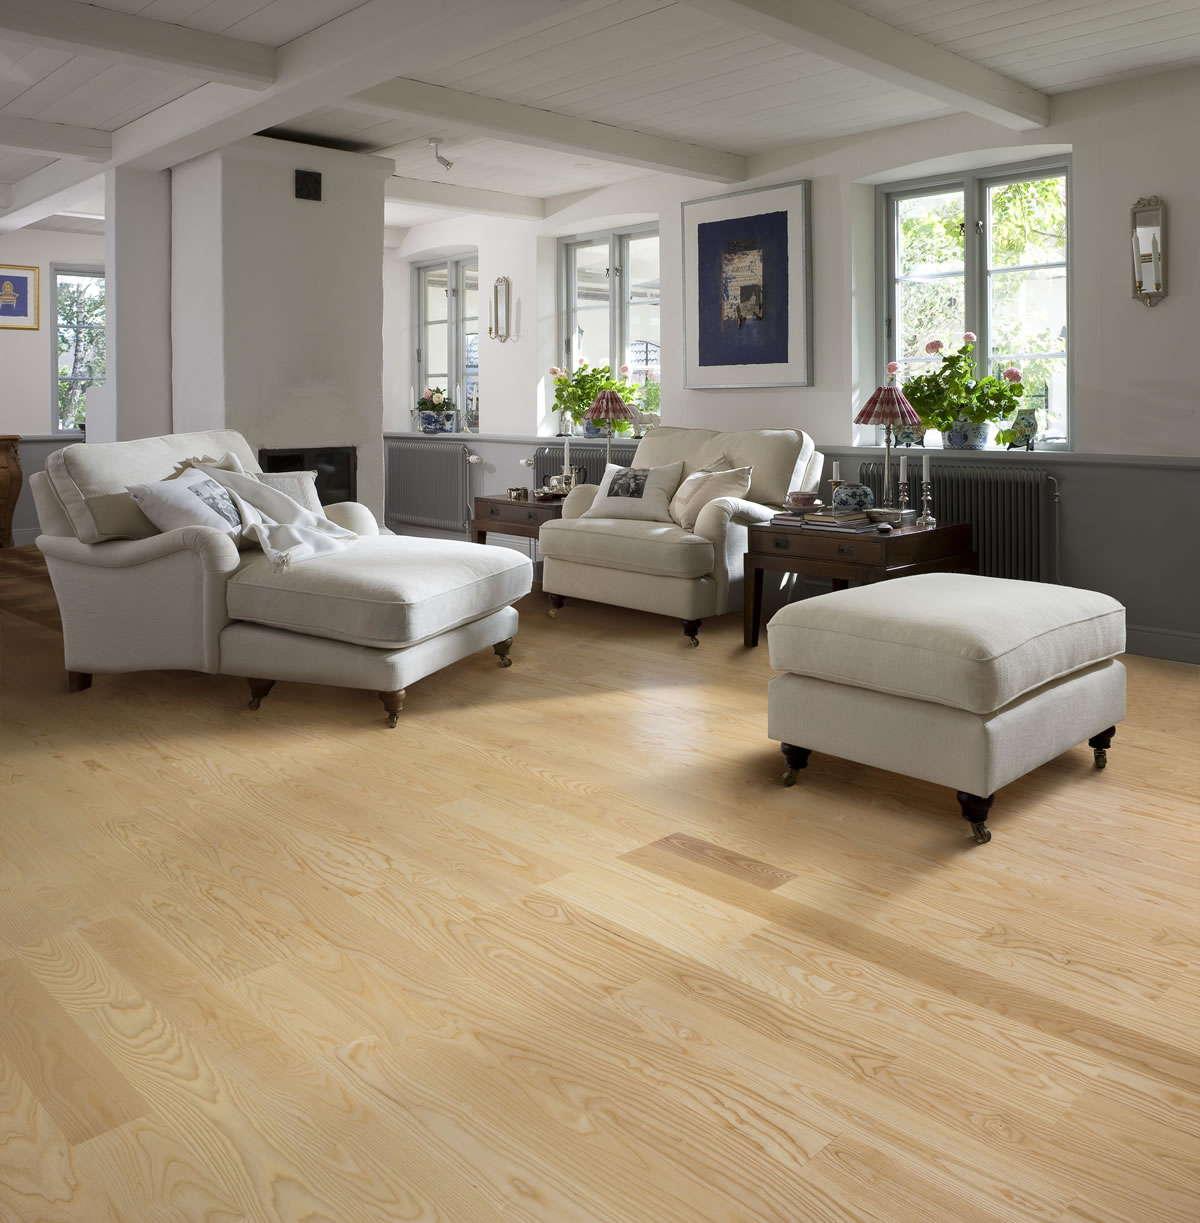 ultra r oak flooring lux save floor matt kahrs at sun engineered wood more